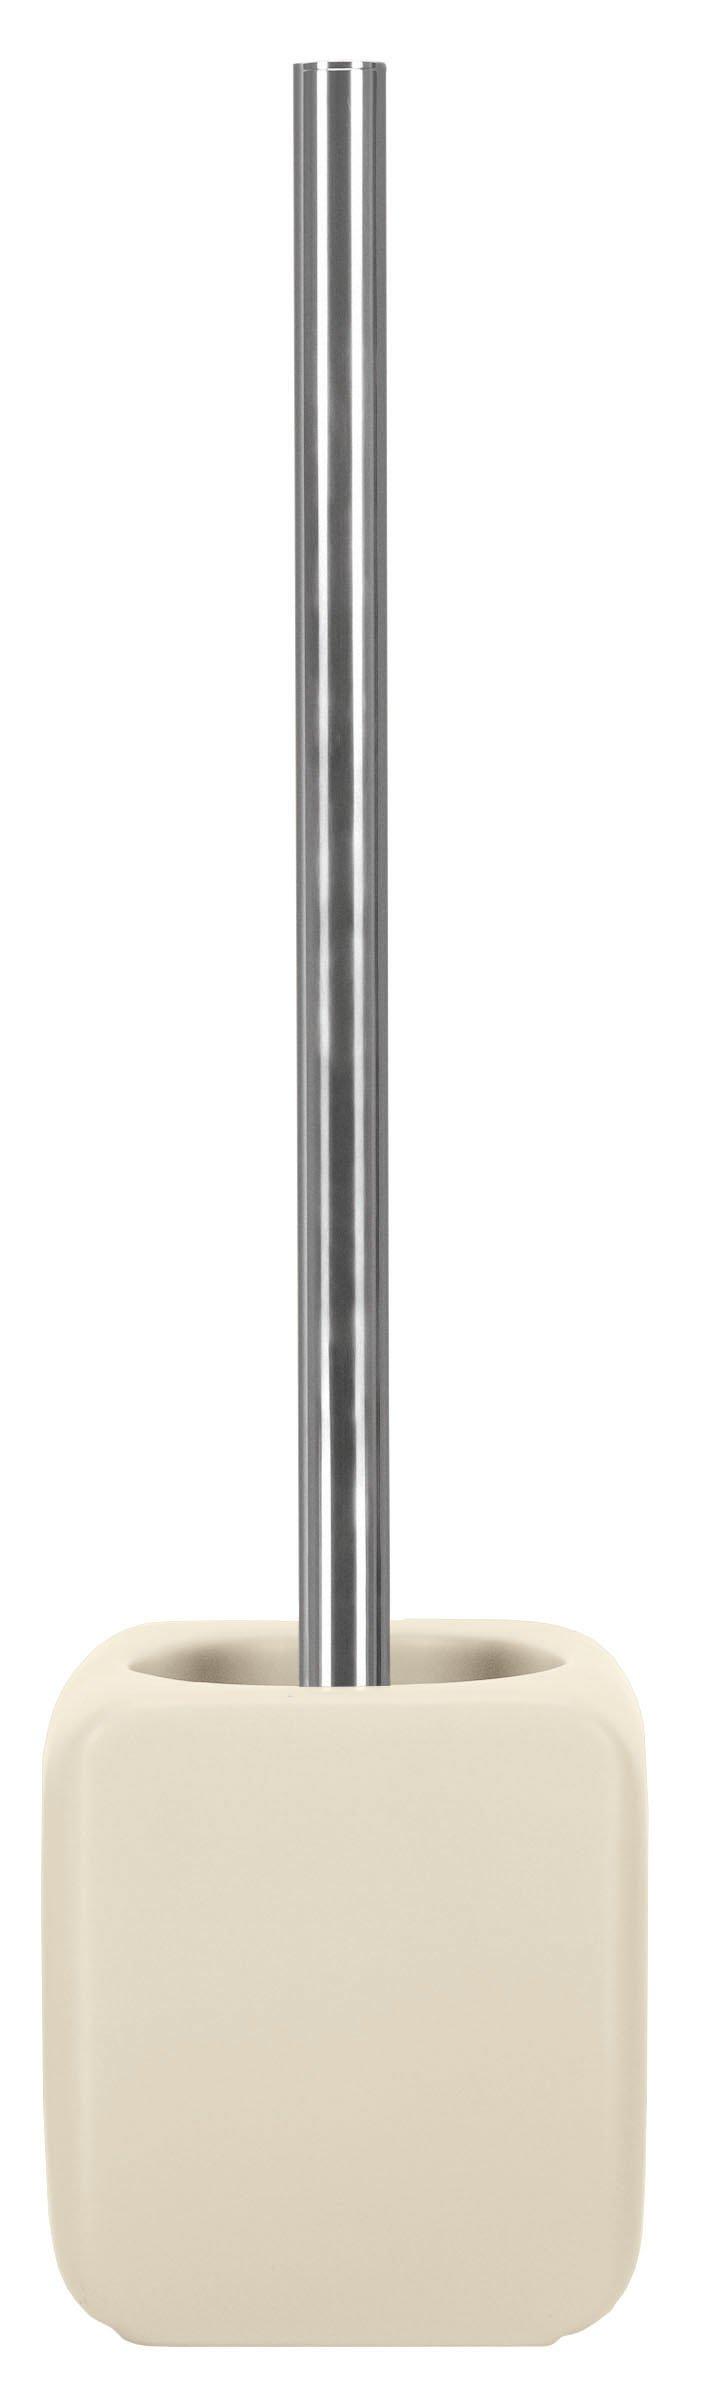 WC-Bürstenhalter Cubic Natur B:10,8cm